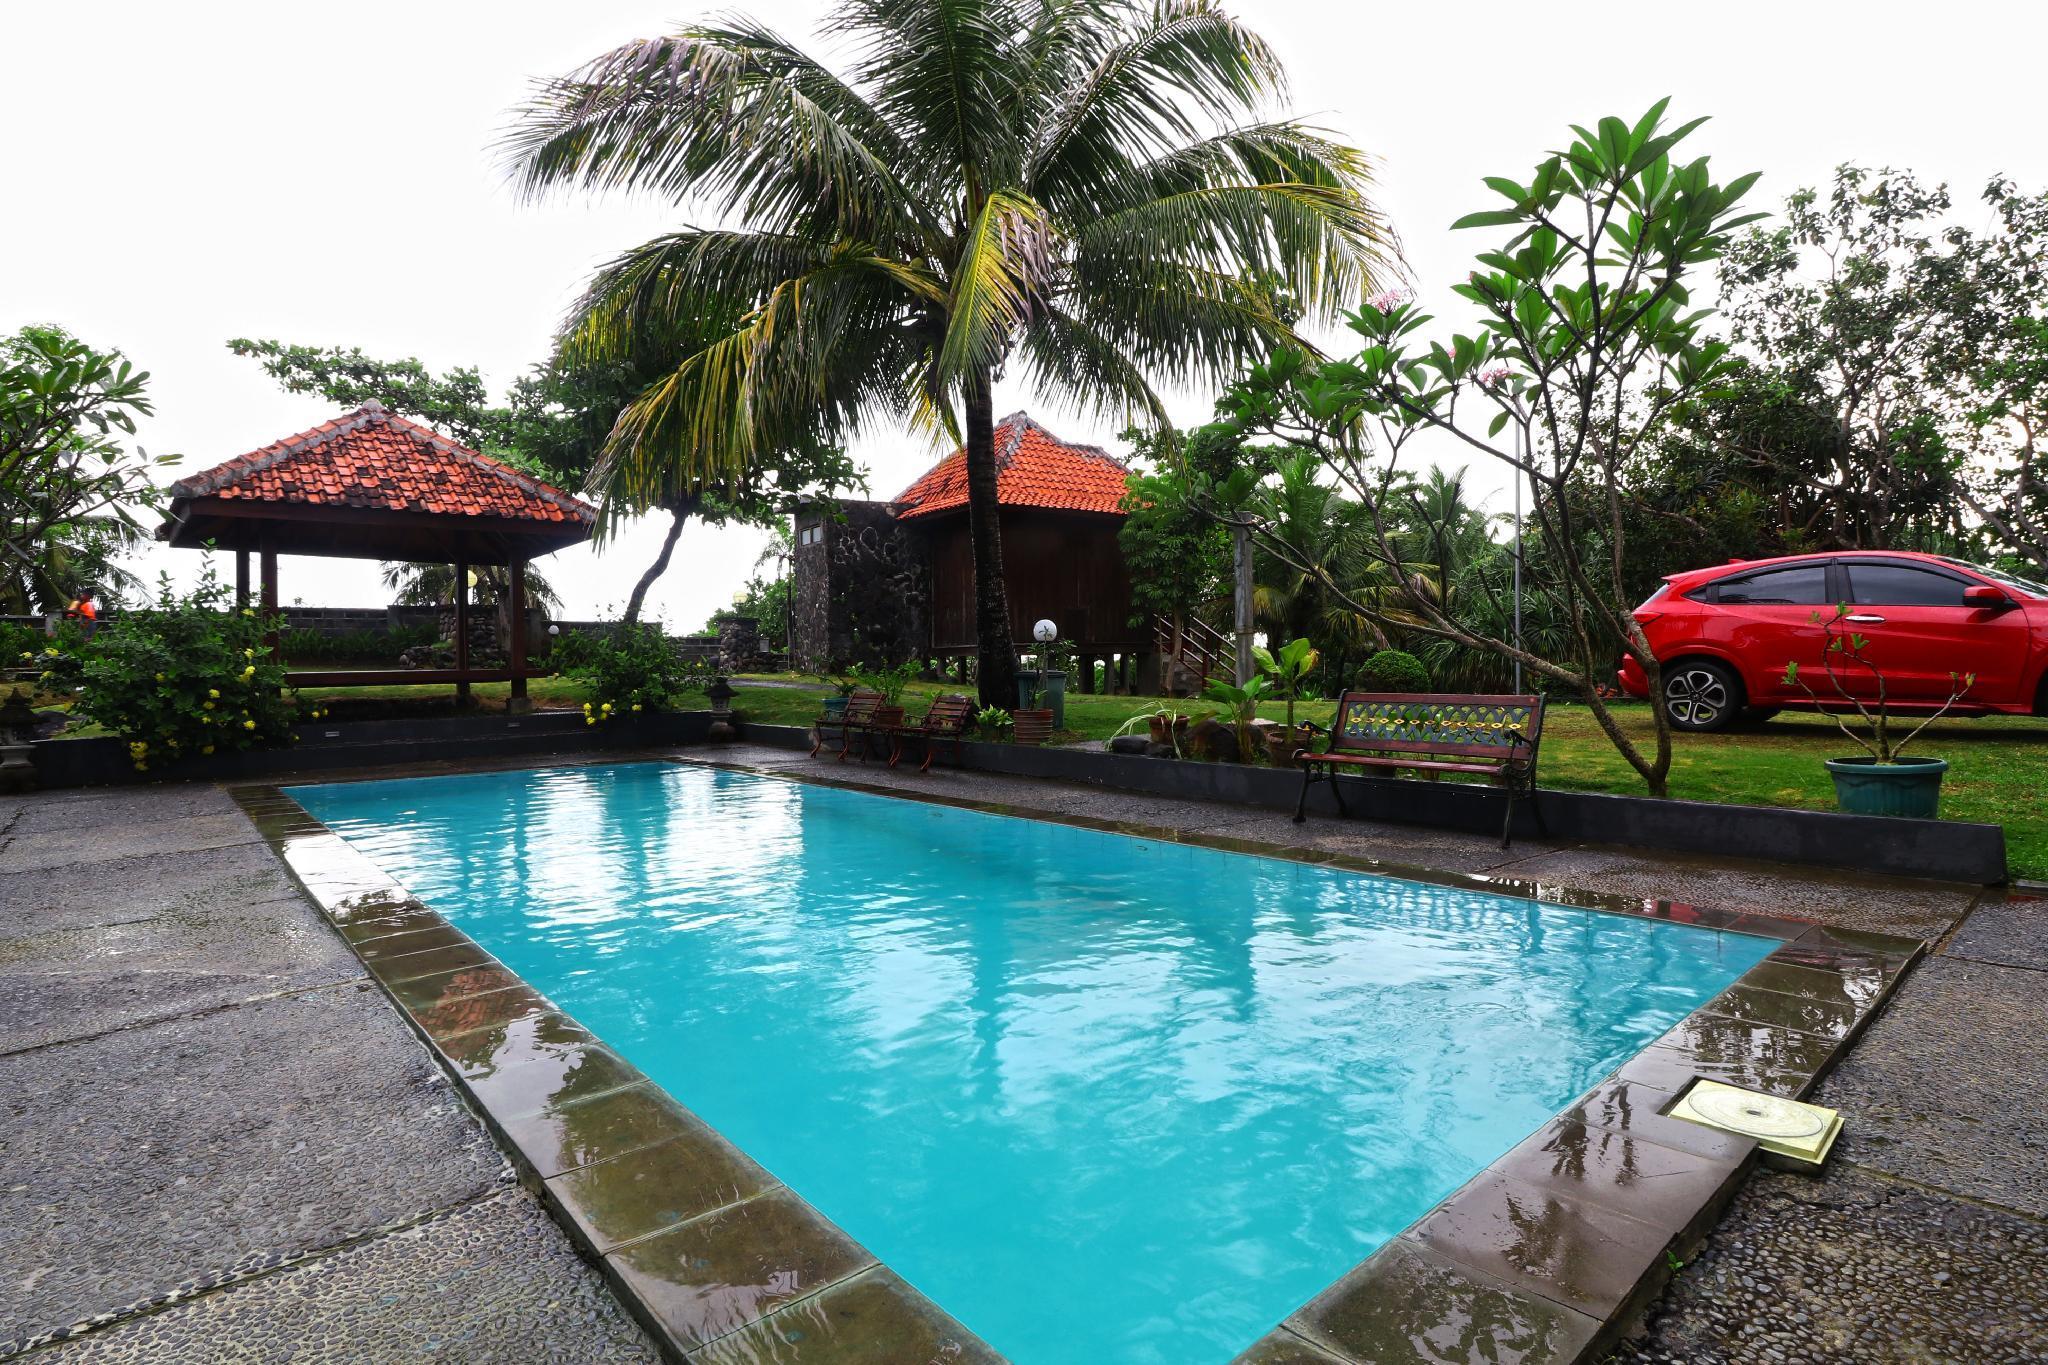 Negla Beach Villa